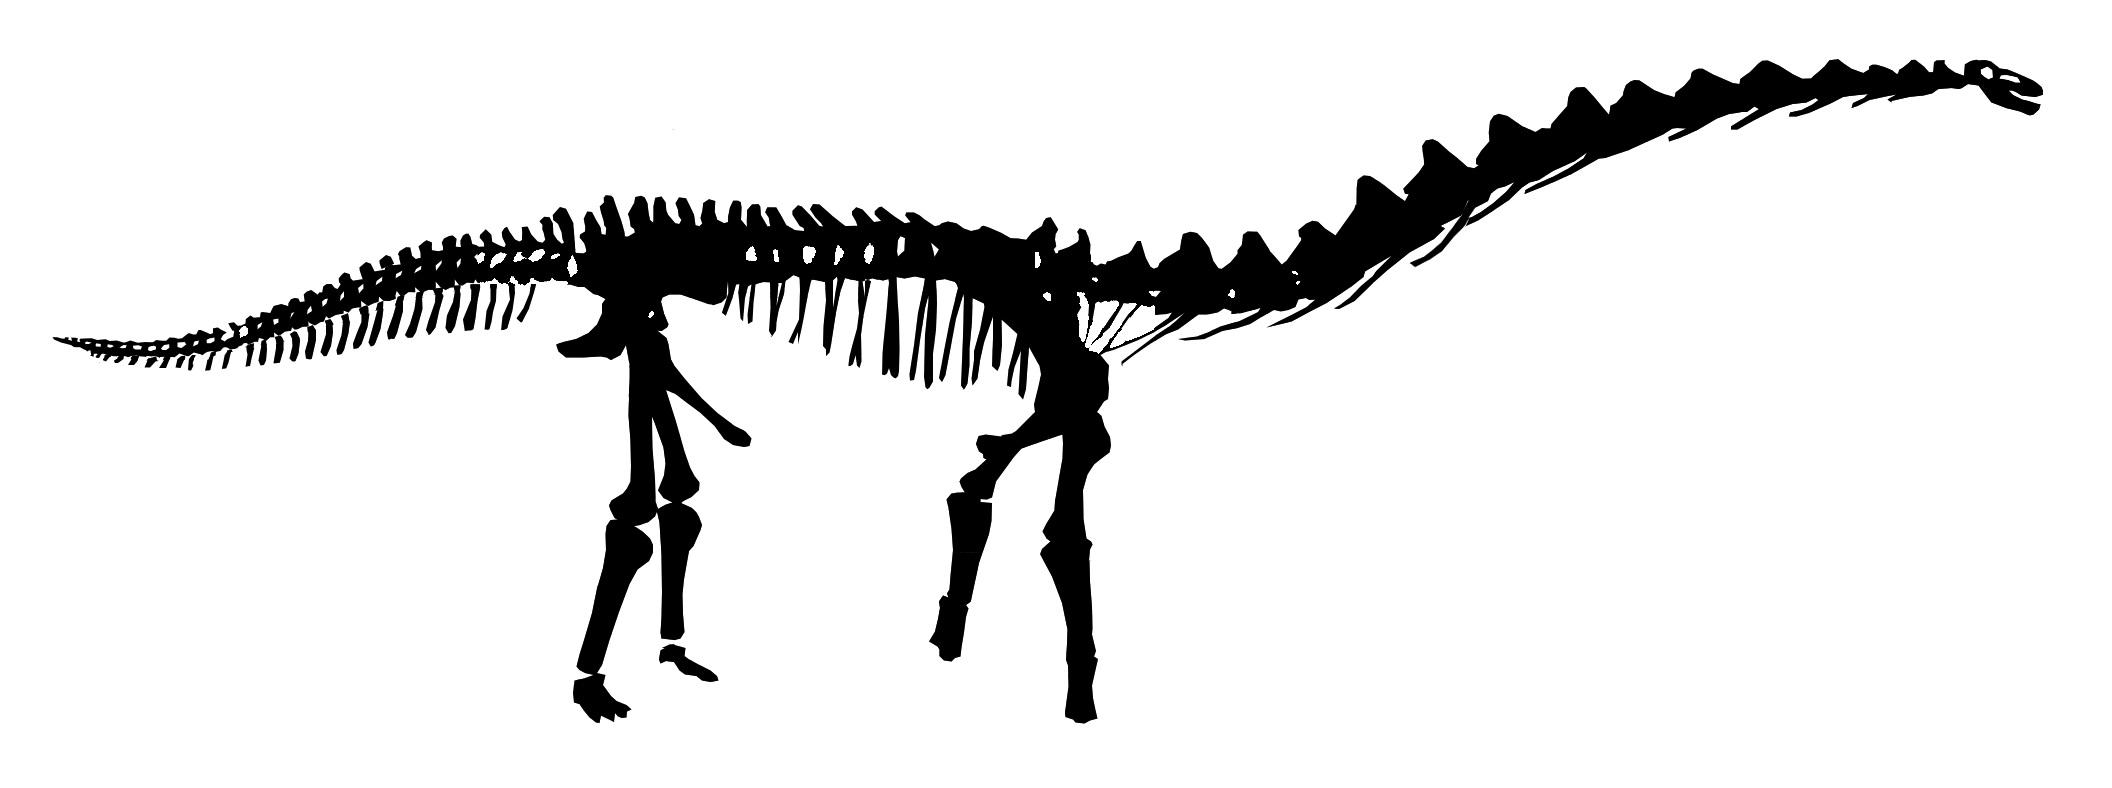 2112x788 Rapetosaurus Is Just Plain Wrong Sauropod Vertebra Picture